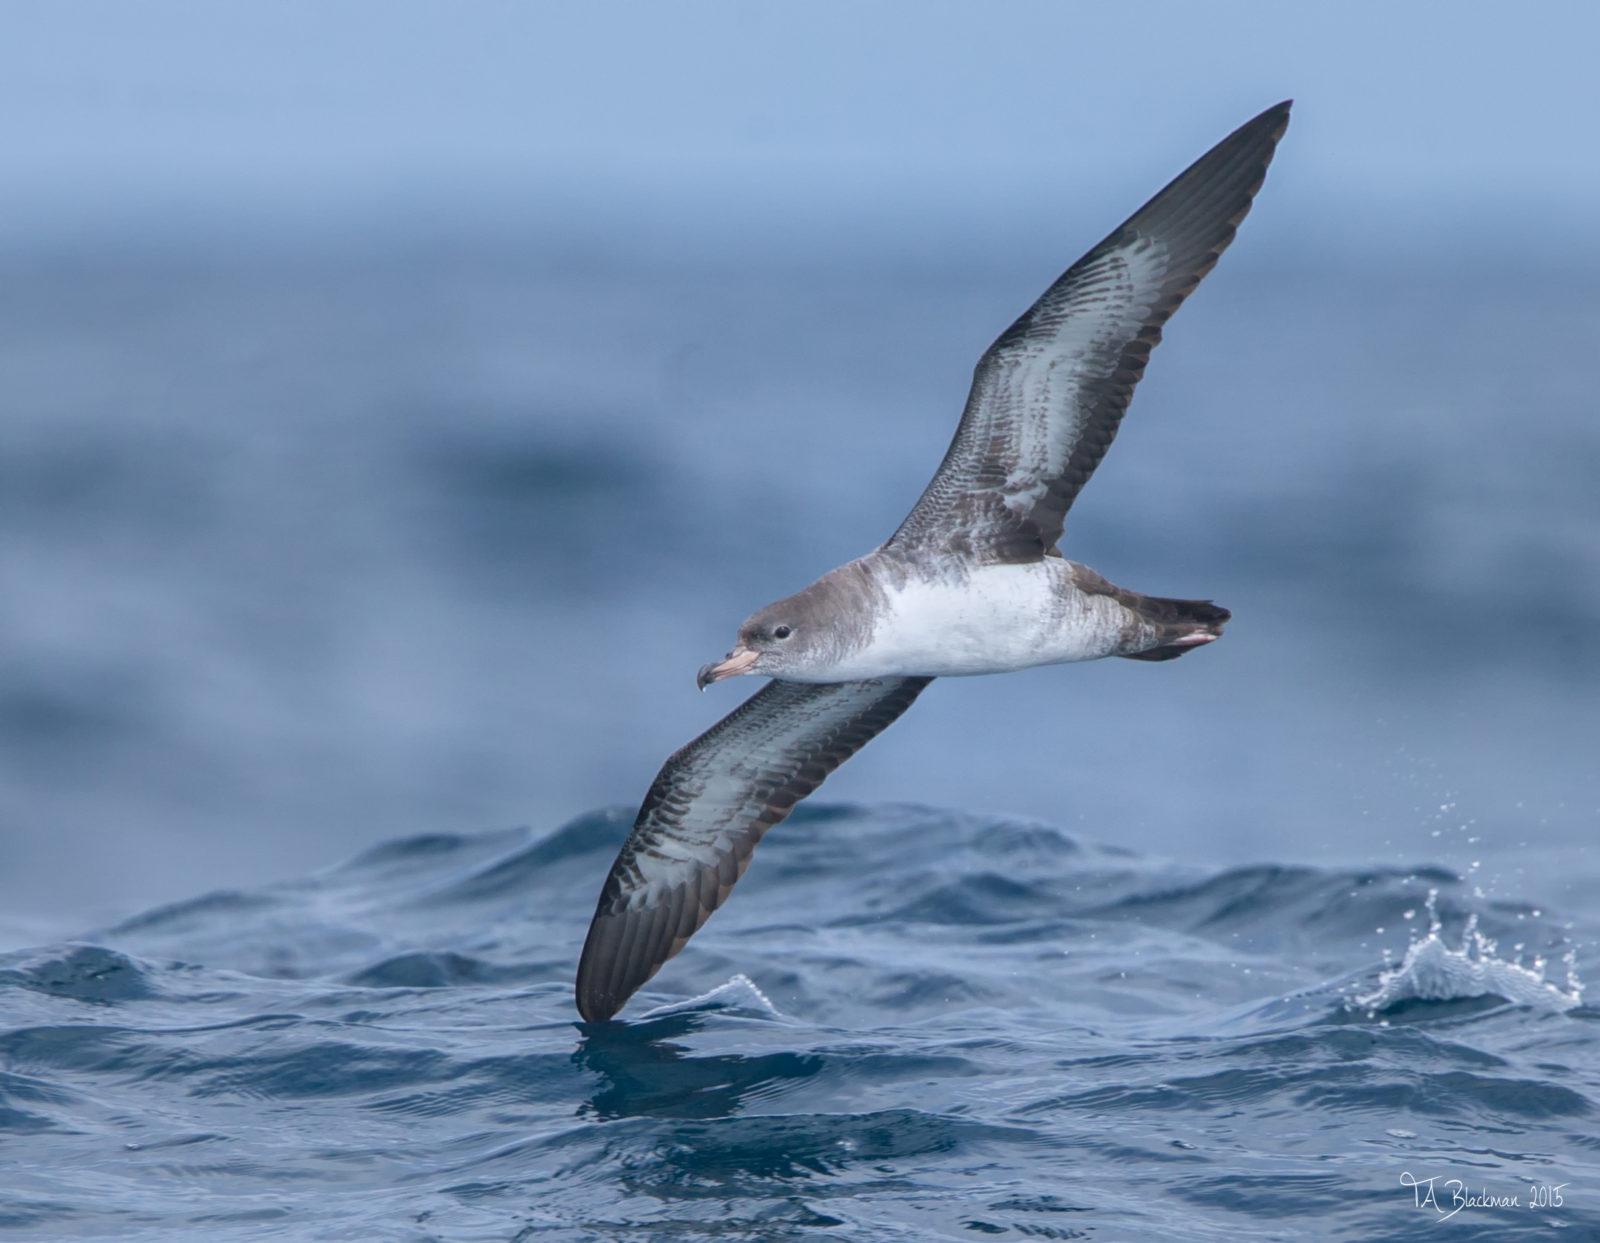 2017 Pelagic Birding Sightings List just published!